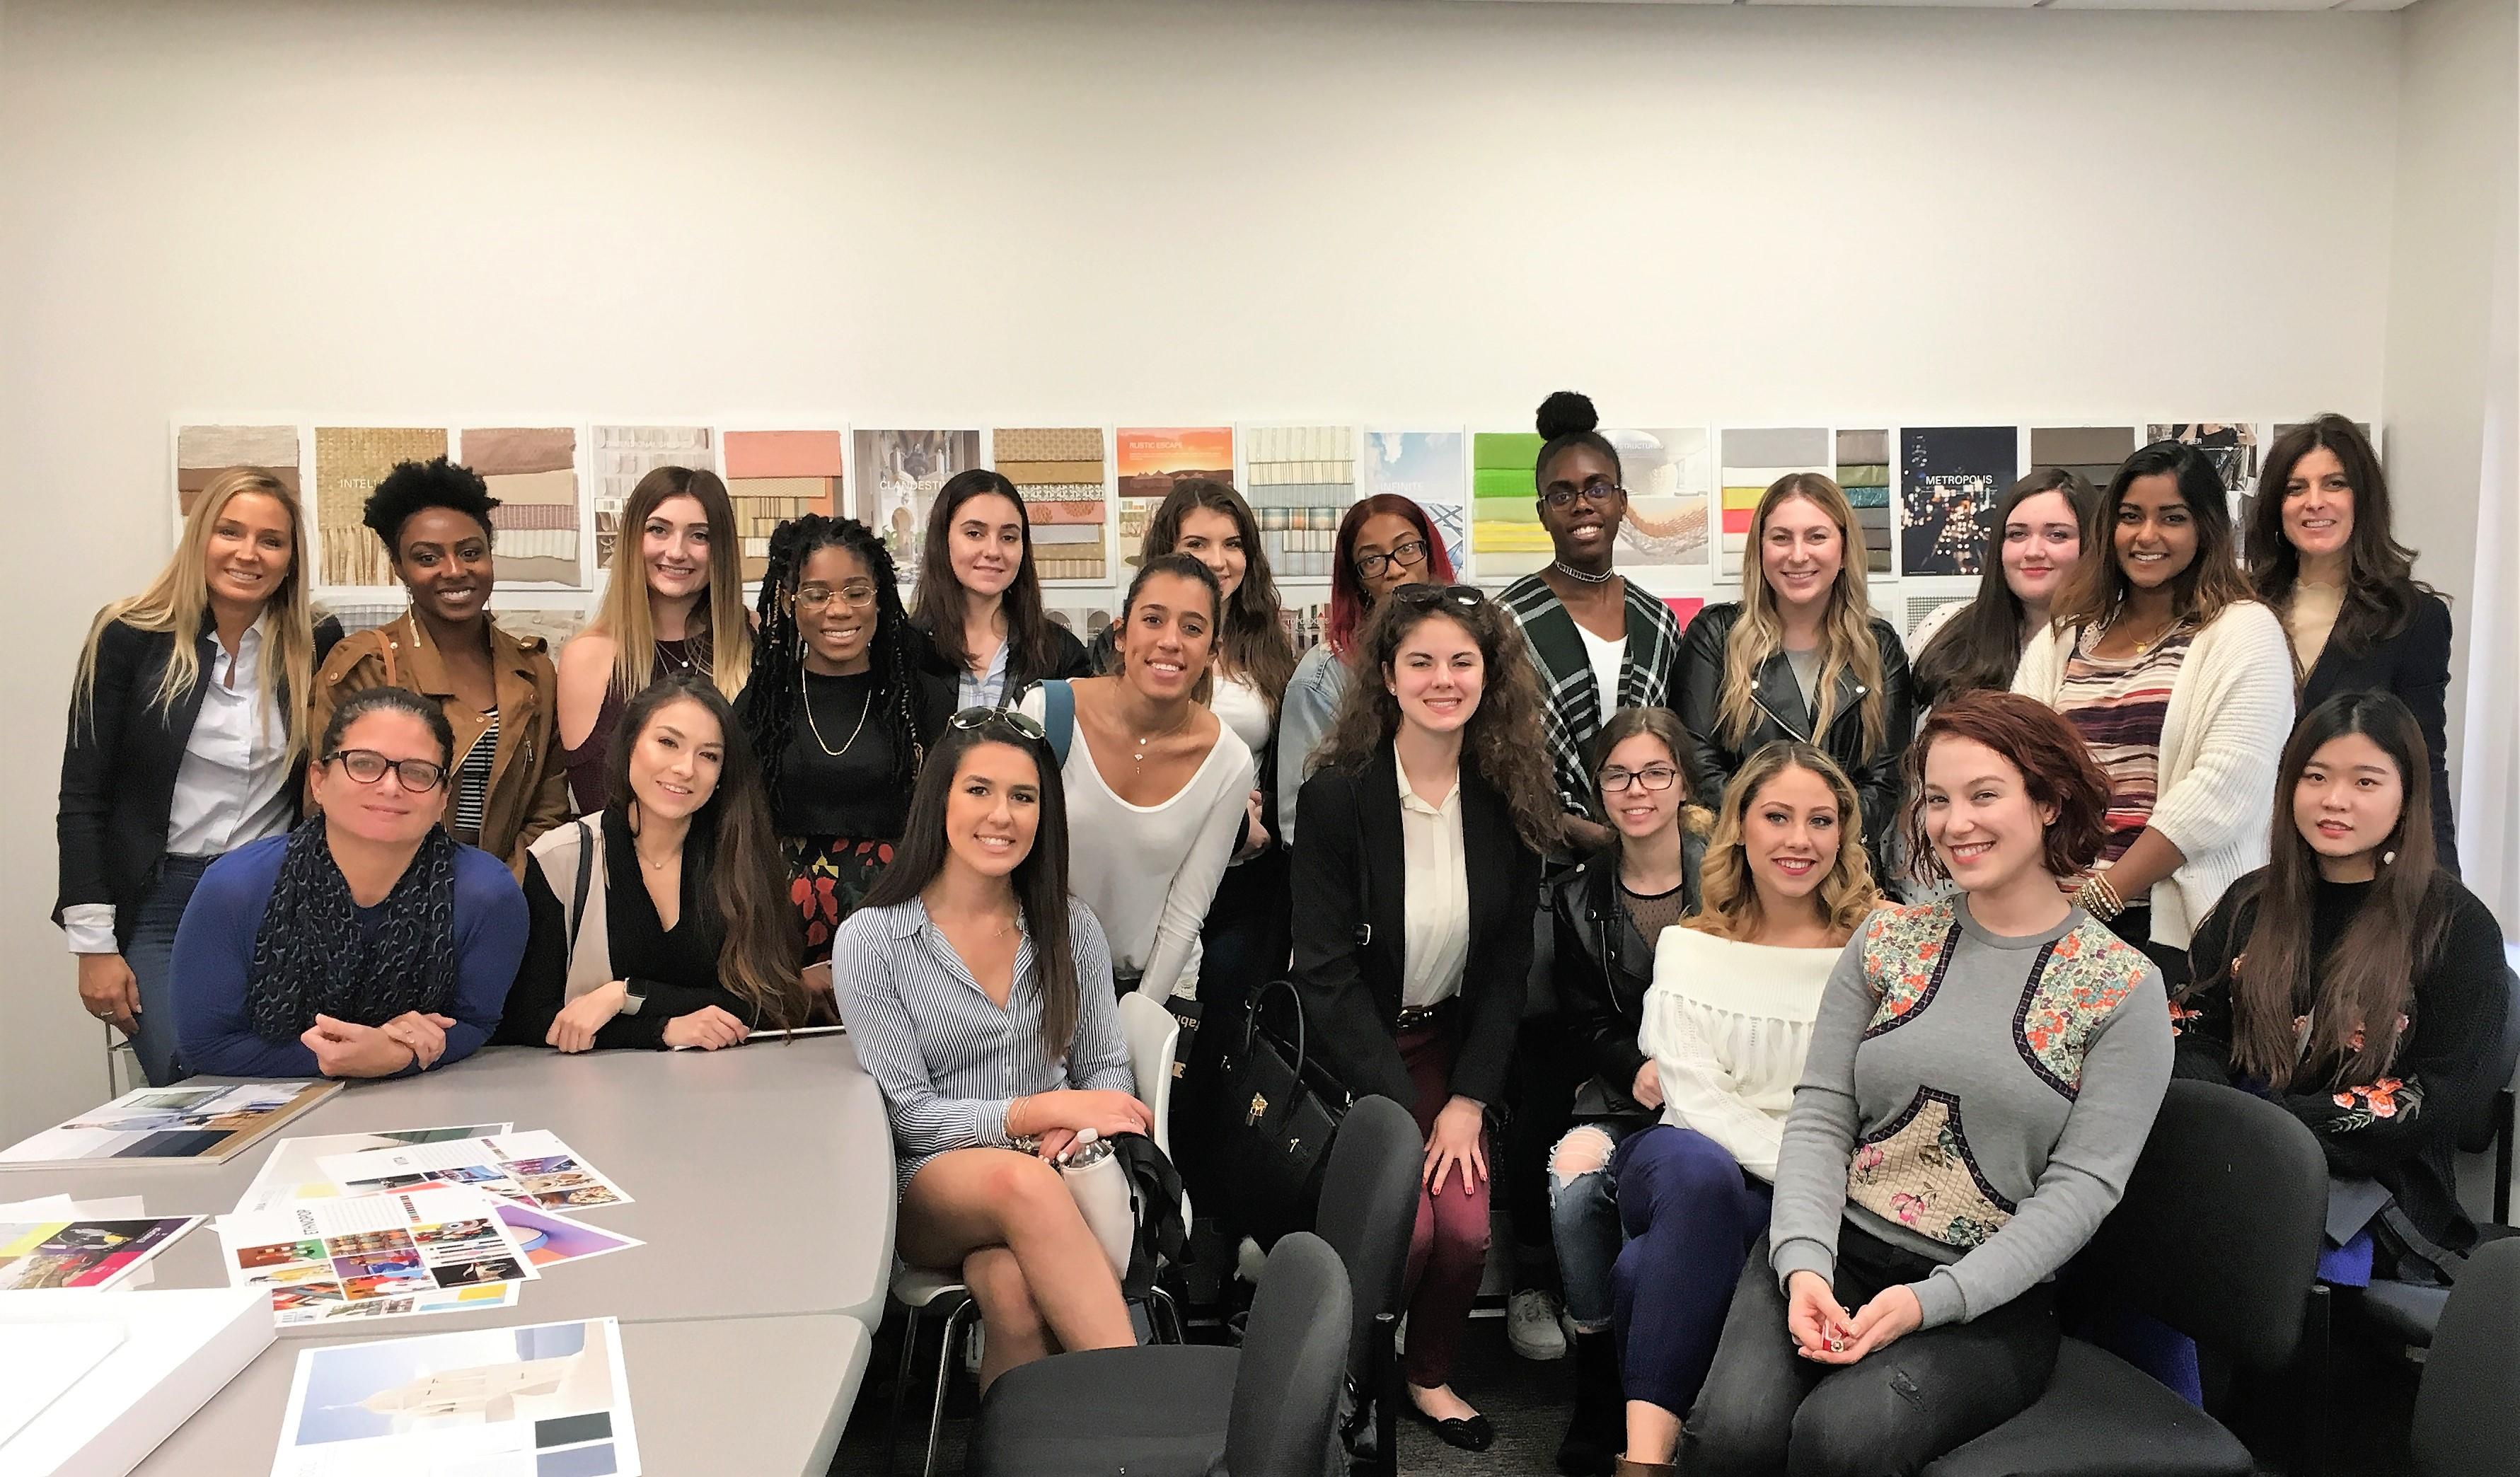 Fashion Merchandising Degree Programs in New York - m 27